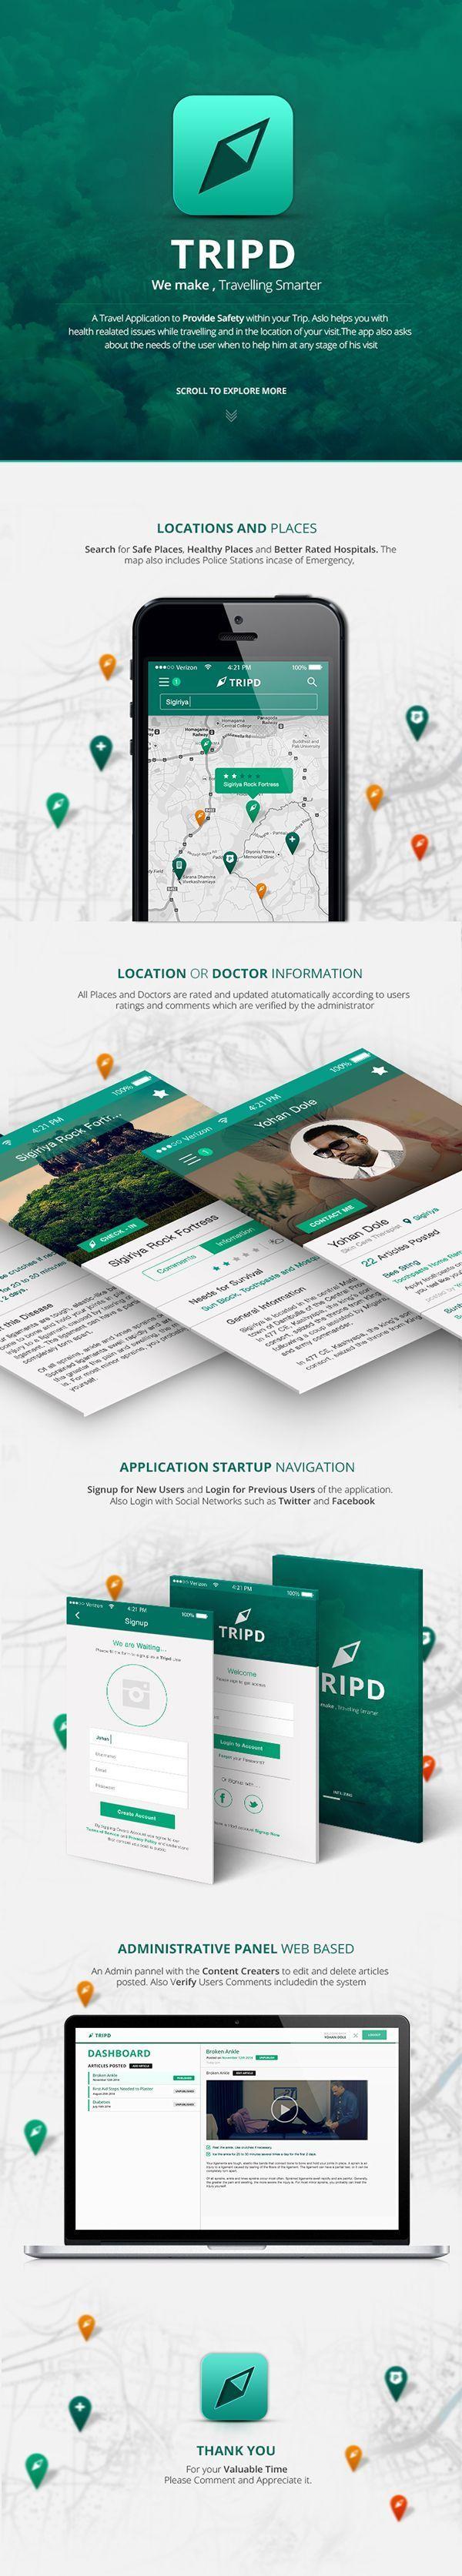 http://www.blogduwebdesign.com/webdesign/15-presentations-applications-mobiles-remarquables/2056